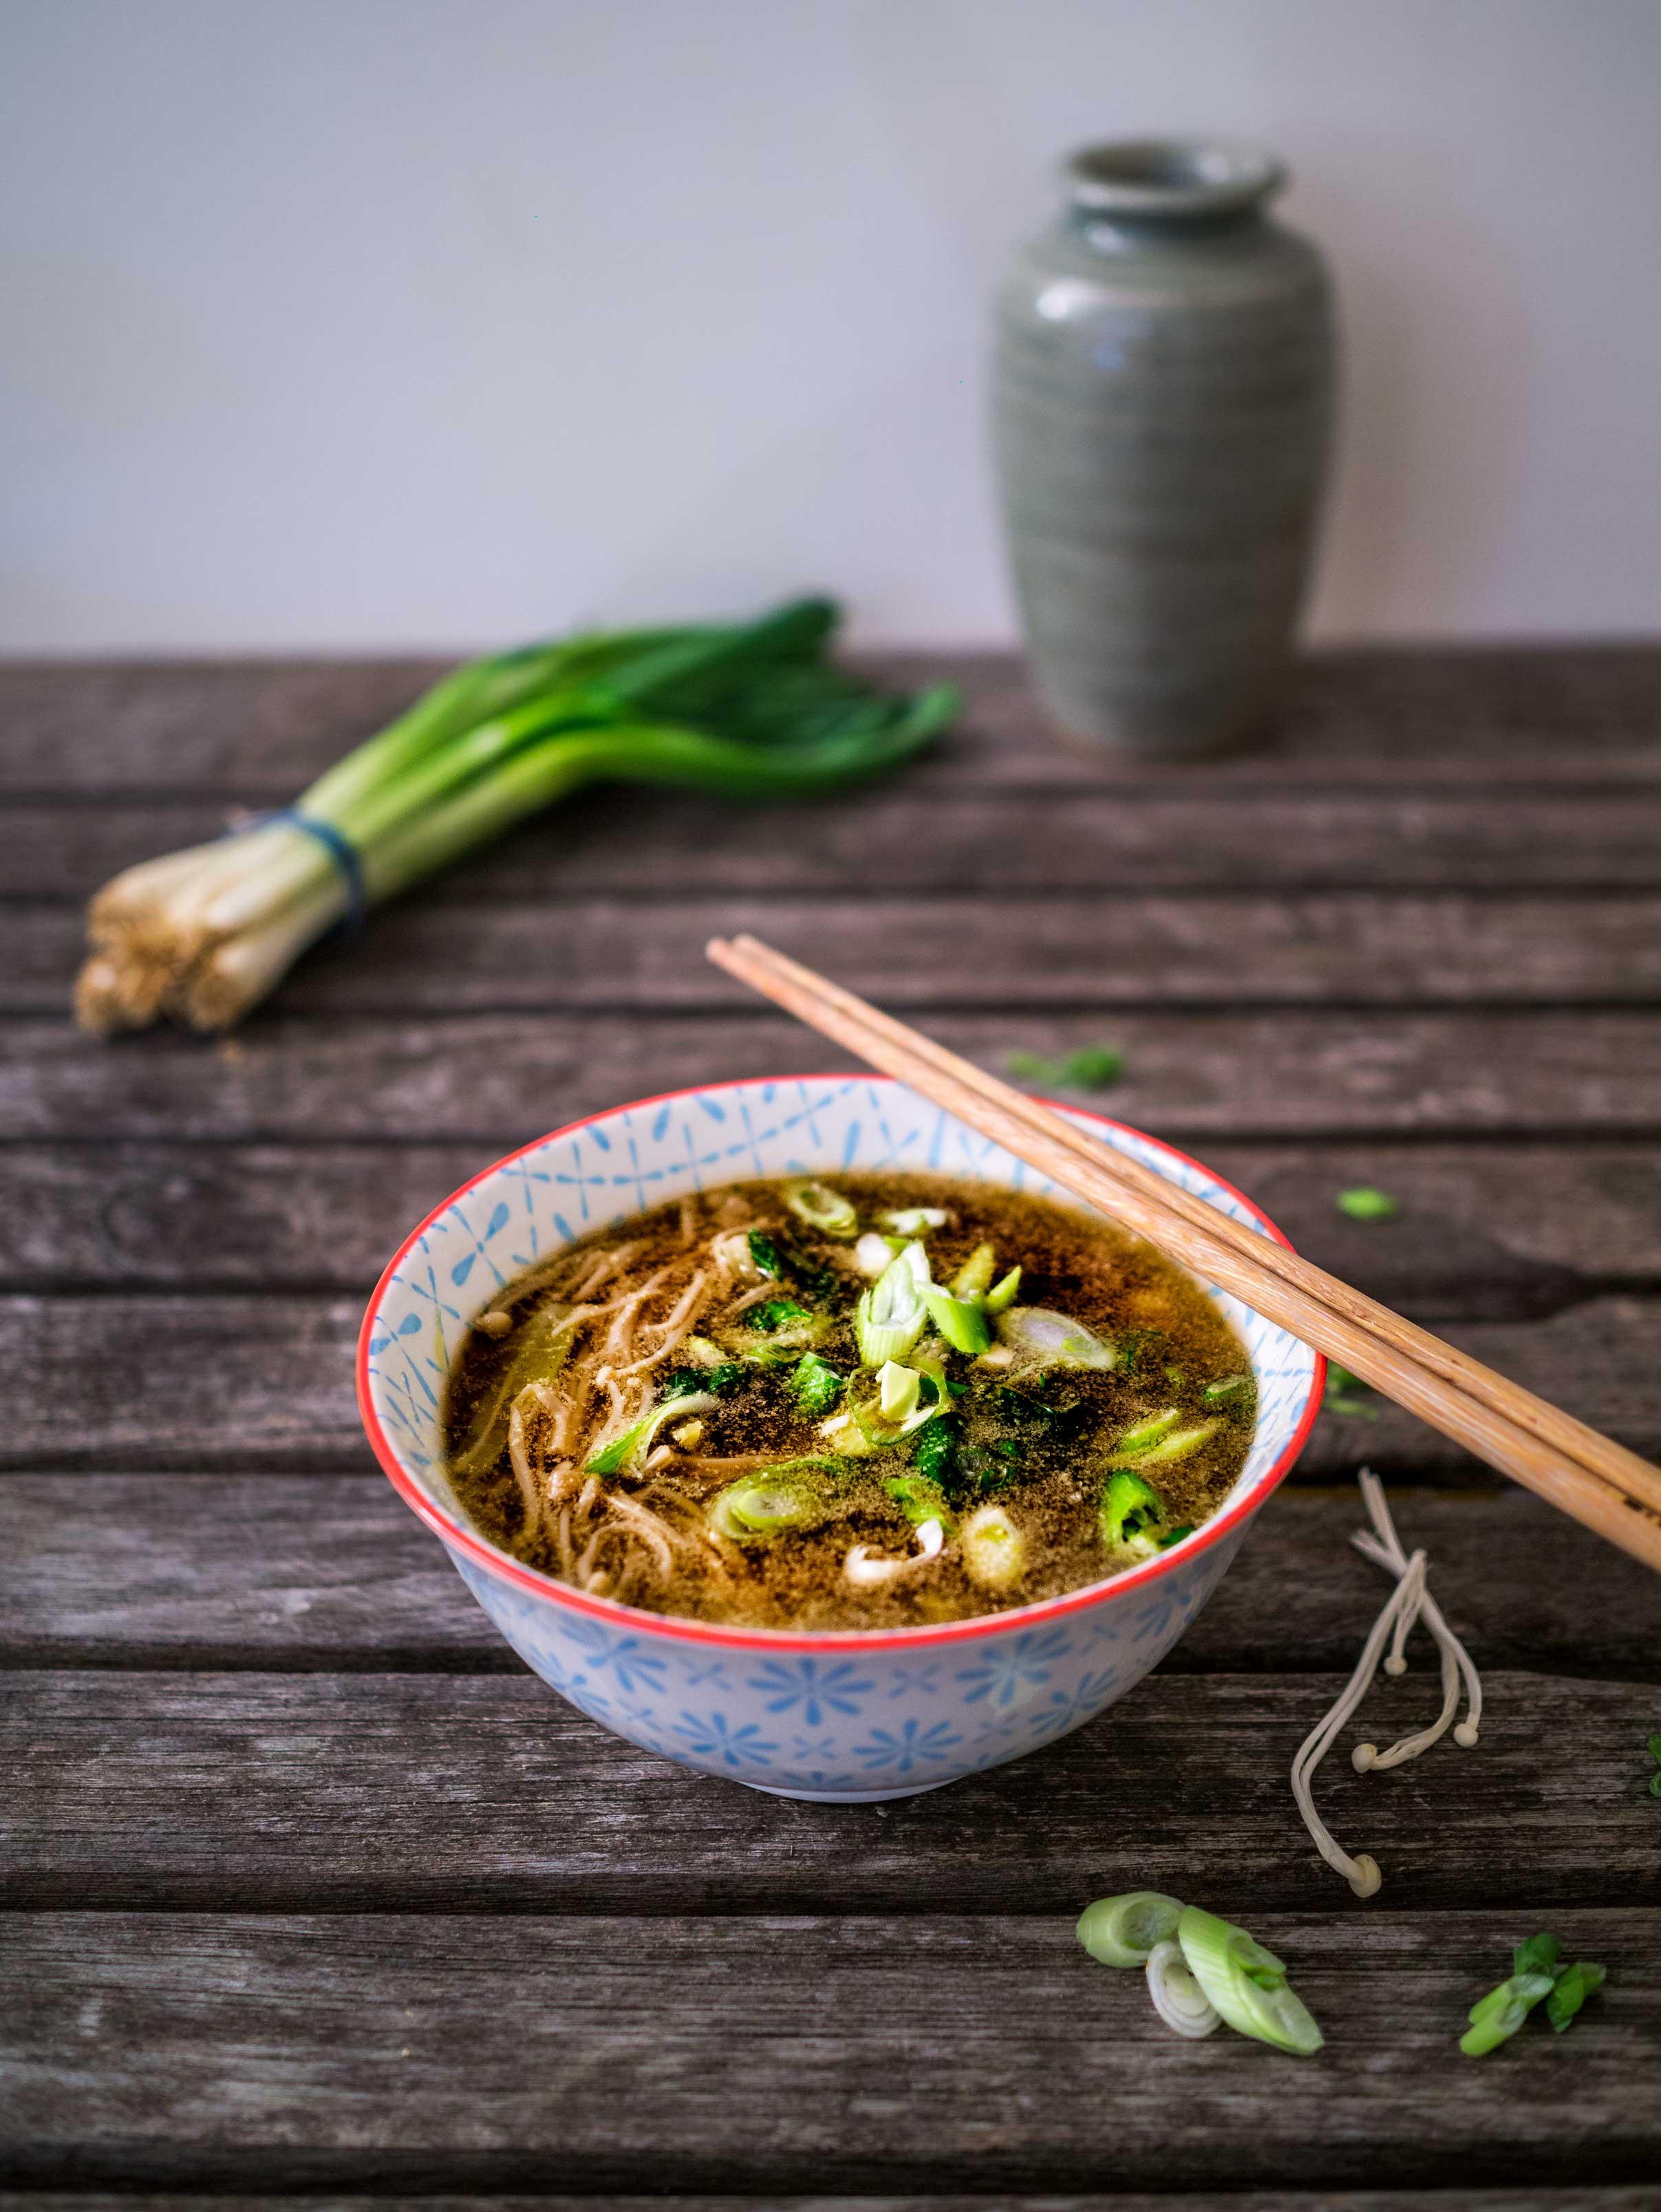 Enoki Mushroom Miso Soup   Discover Delicious   www.discoverdelicious.org   Vegan Food Blog